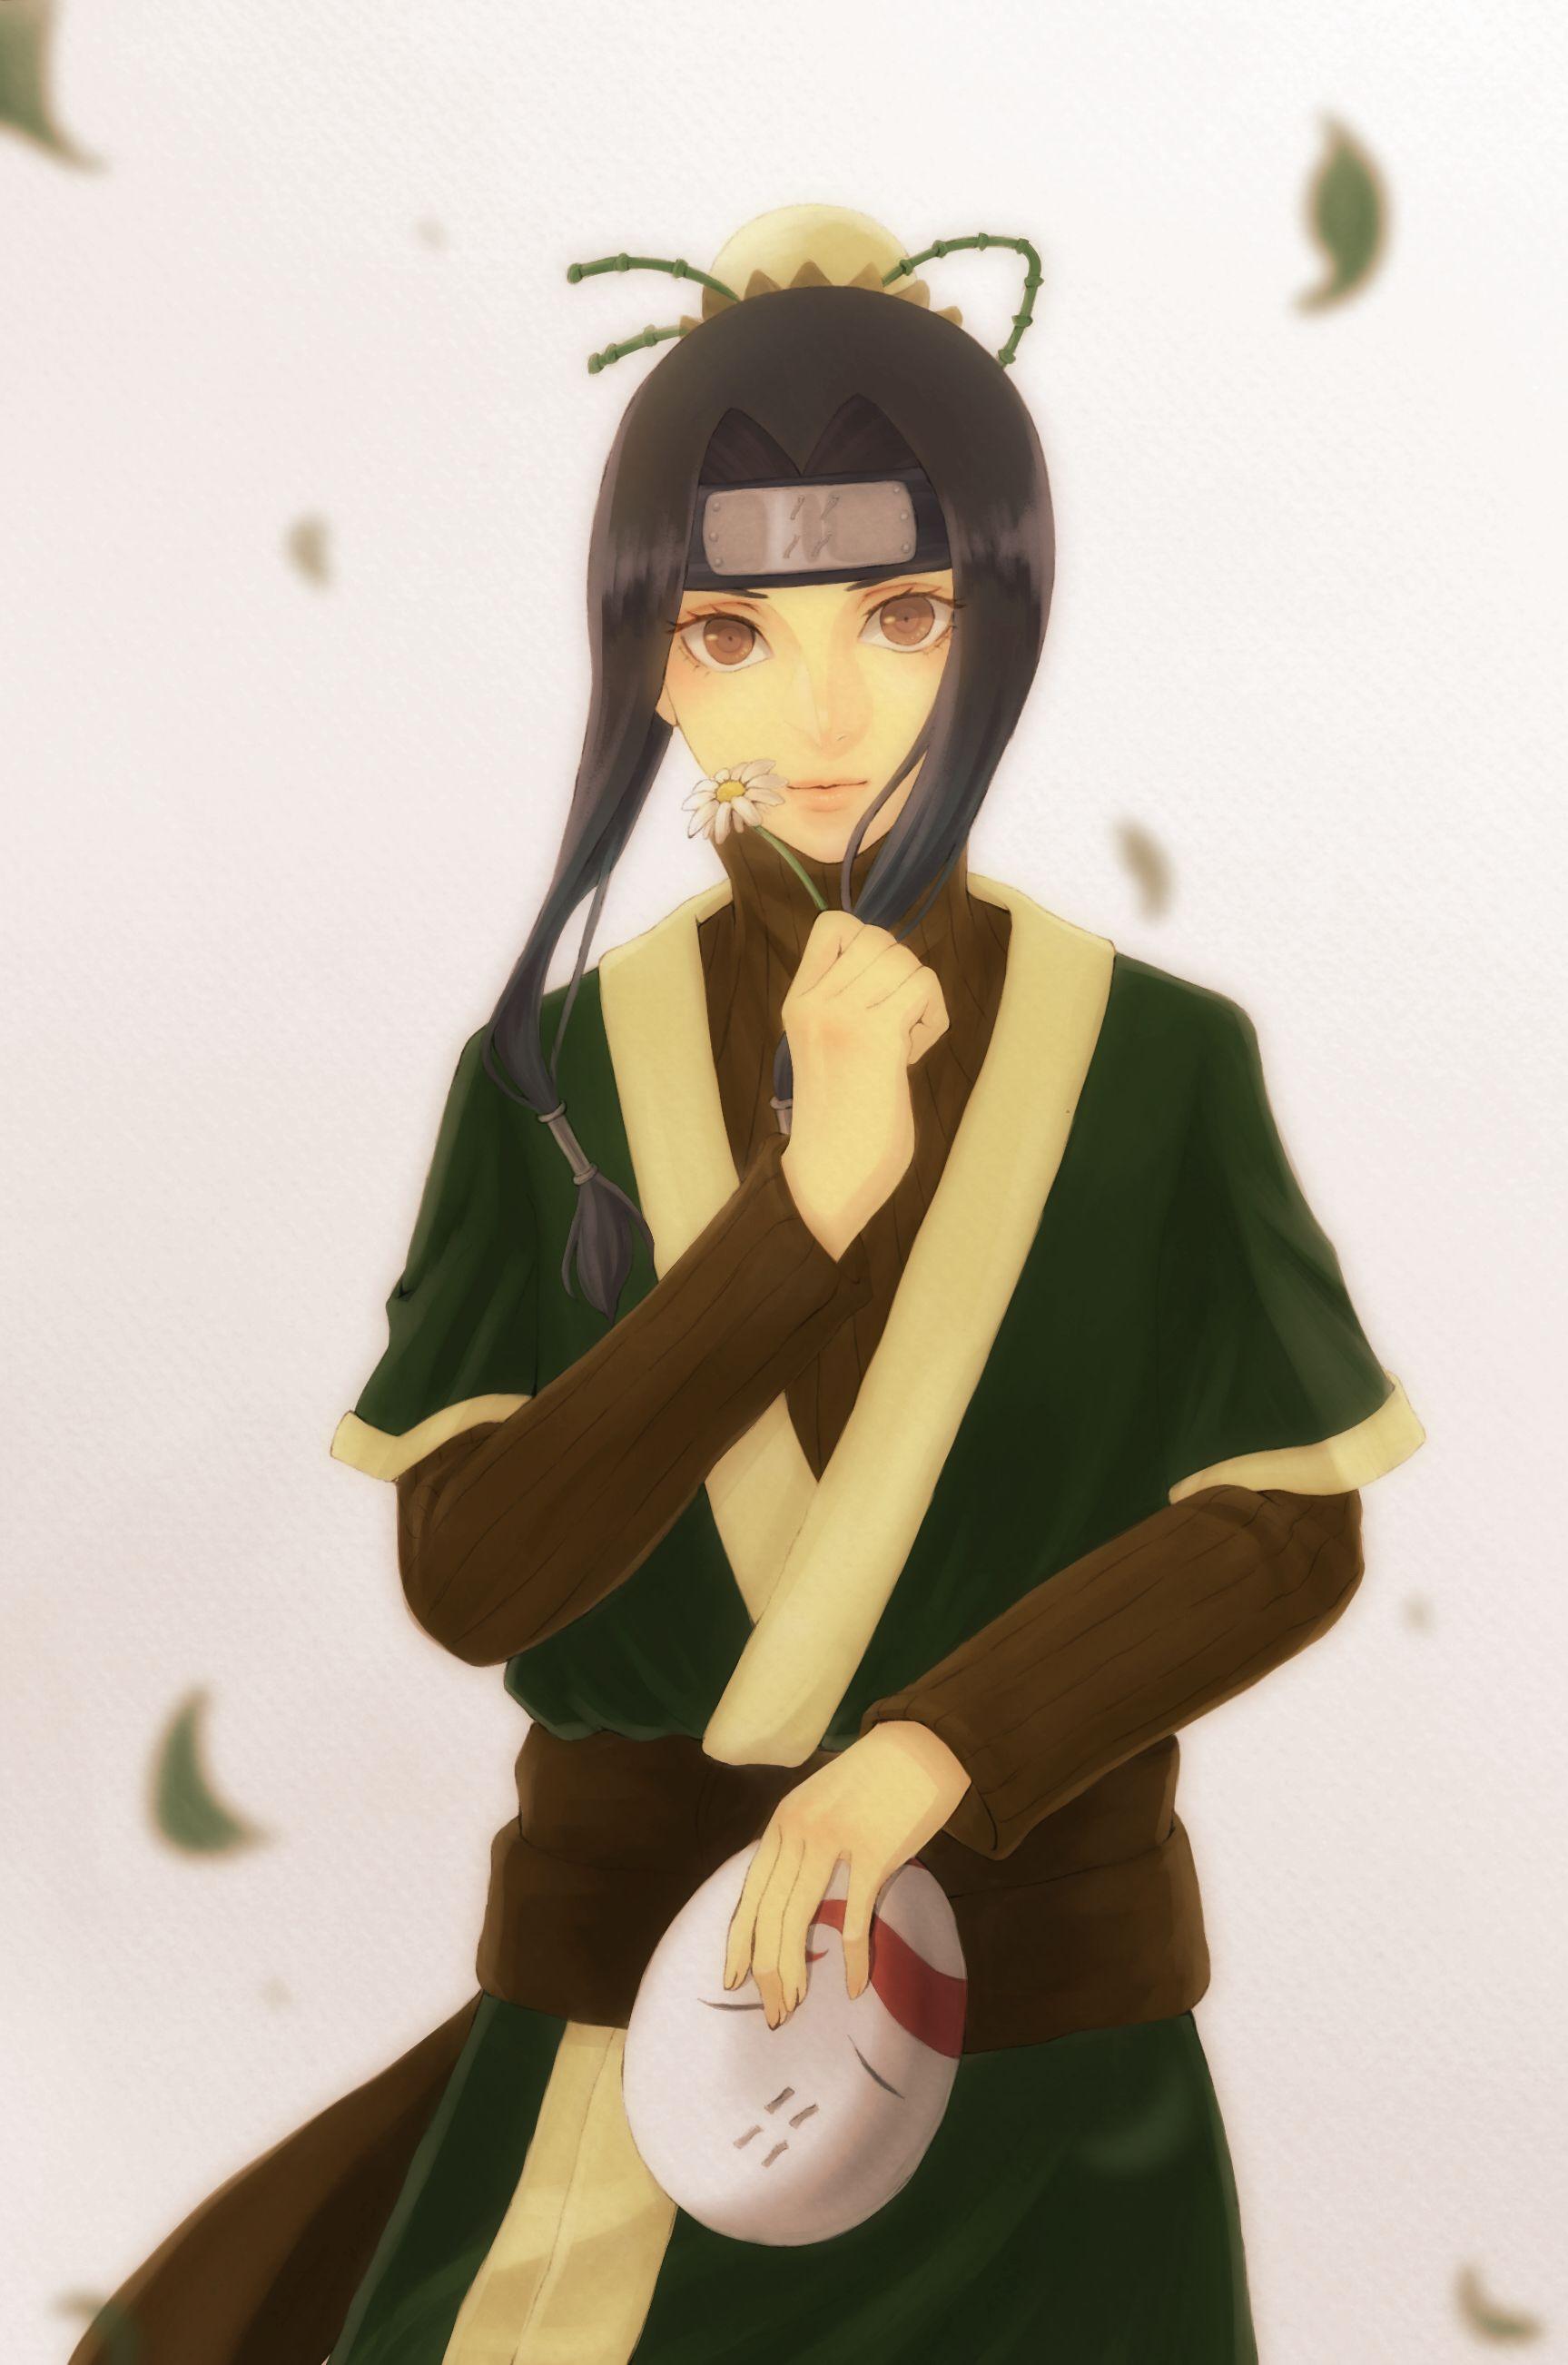 Haku Naruto 1809860 Naruto Naruto Cosplay Naruto Characters I still have a lot more to learn. haku naruto 1809860 naruto naruto